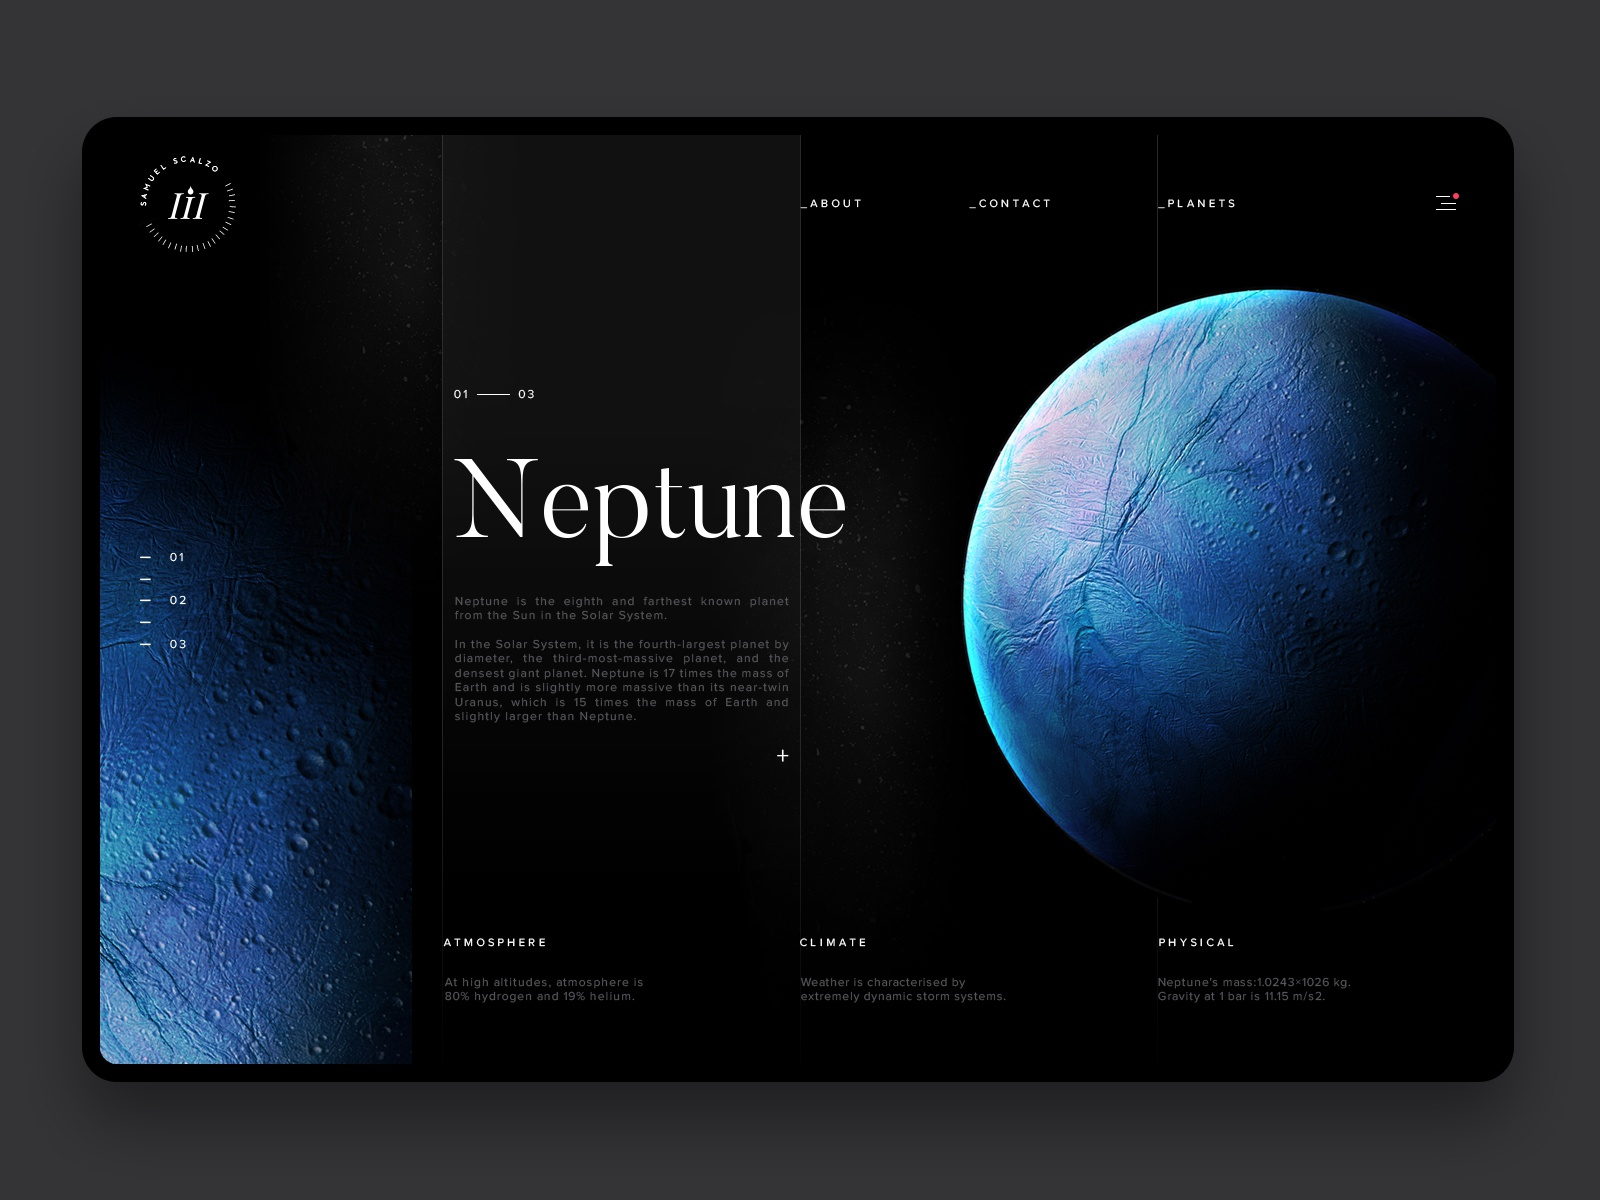 Space exploration neptune hd